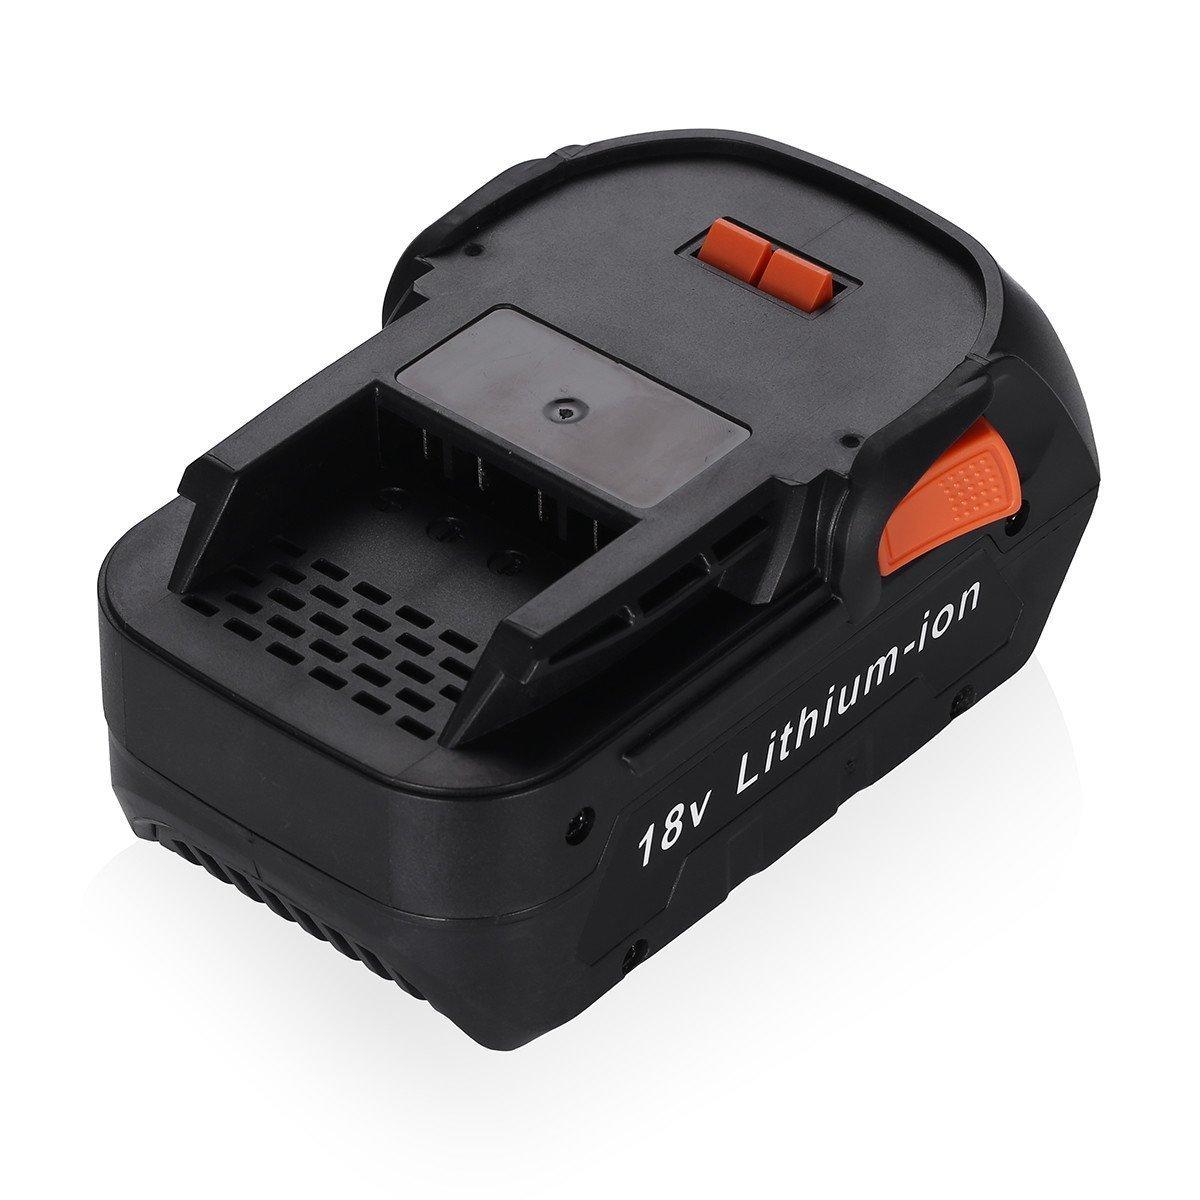 Powerextra 2 0ah Ridgid Power Tool Battery Replacement